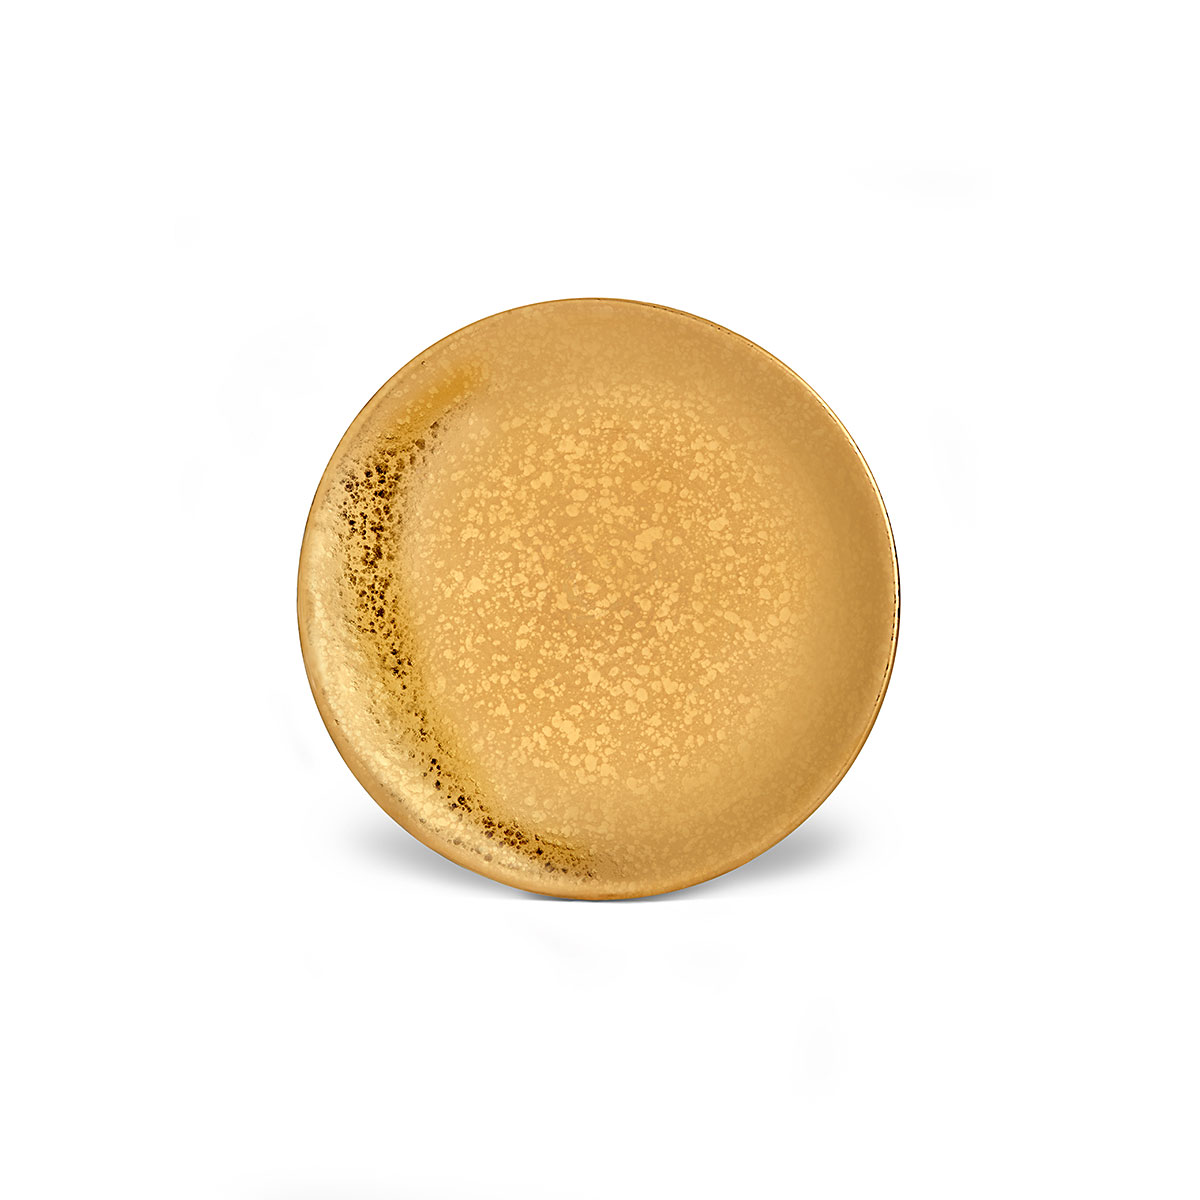 L'Objet I Alchimie Bread + Butter Plate Gold